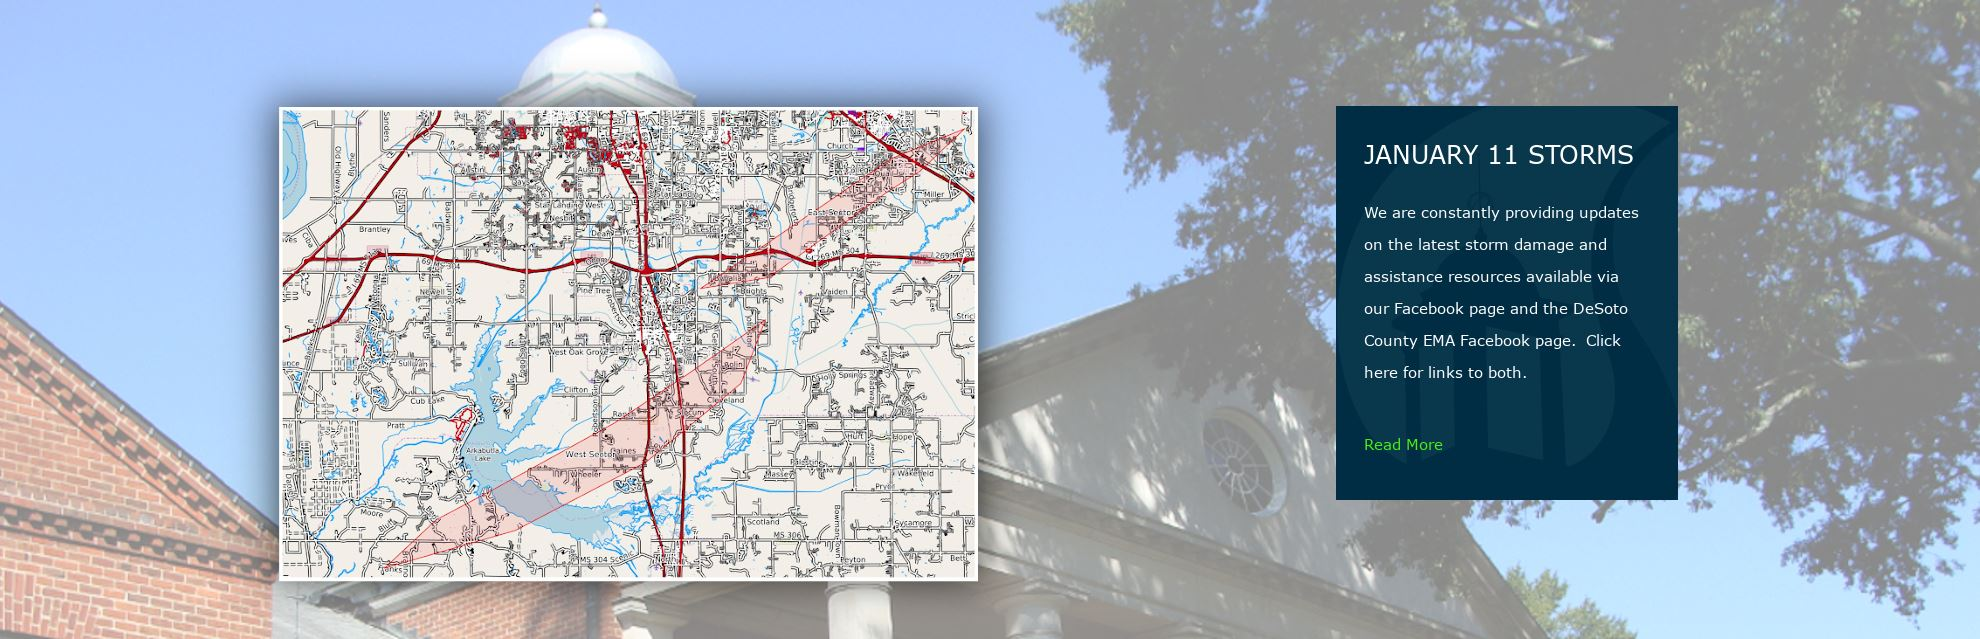 desoto zoning map, desoto county map, desoto parish line map, desoto parish school zone map, desoto traffic map, on desoto county gis map